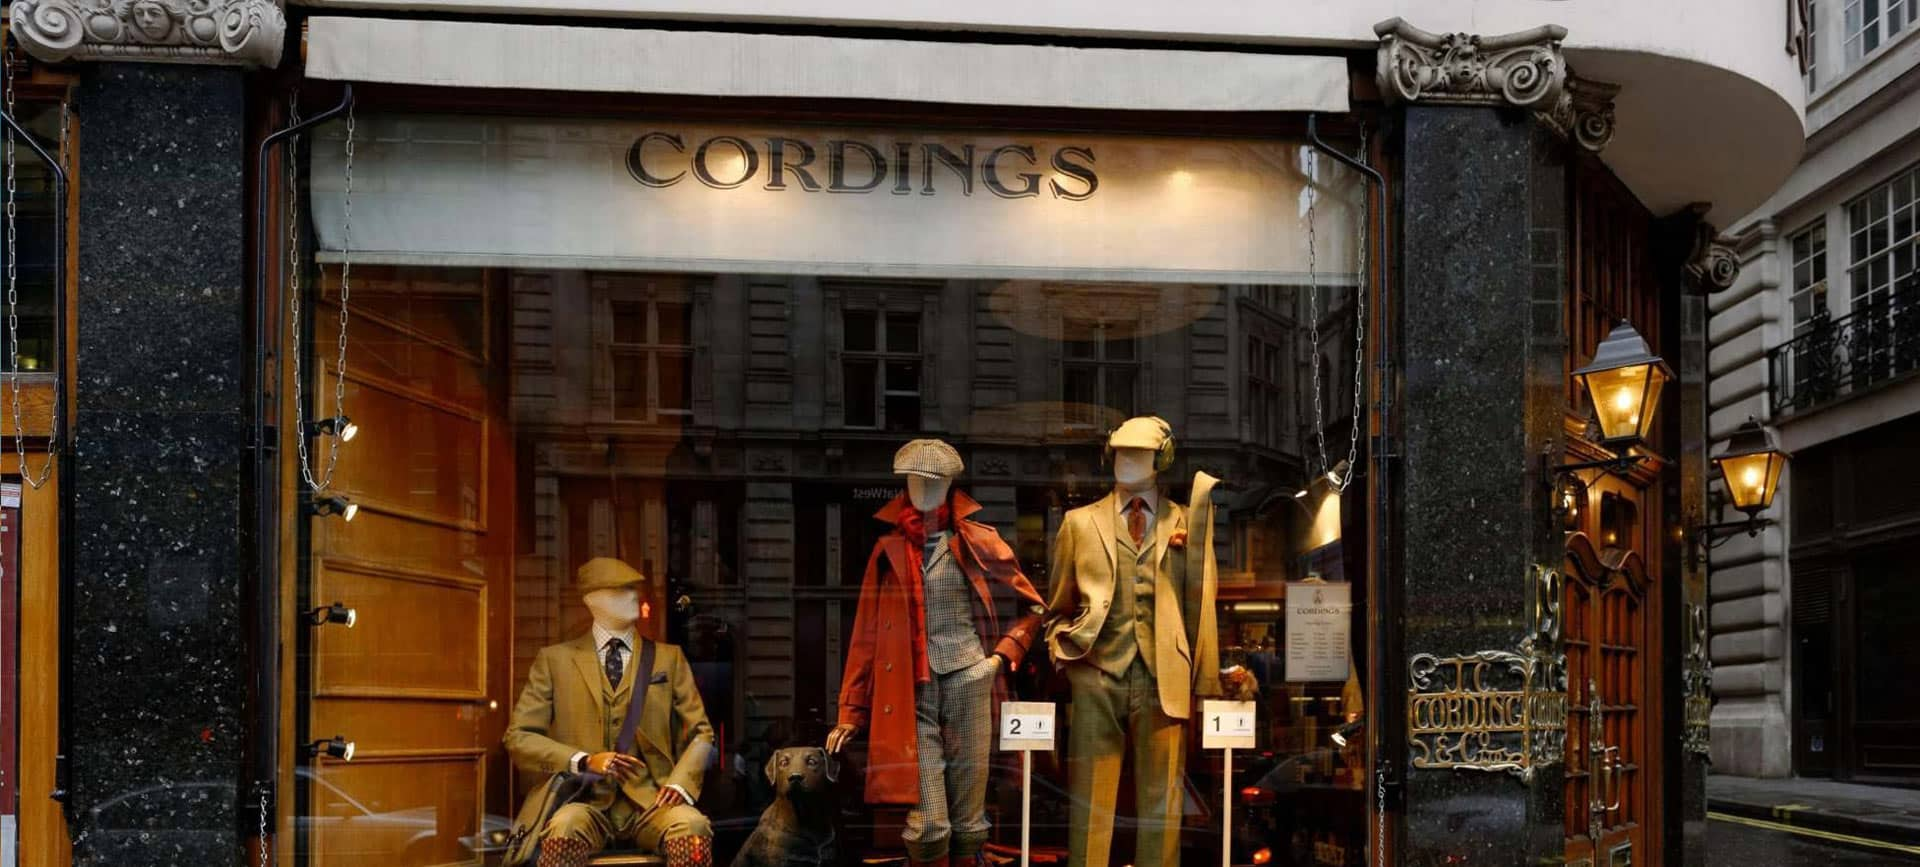 J C Cordings and Co Ltd